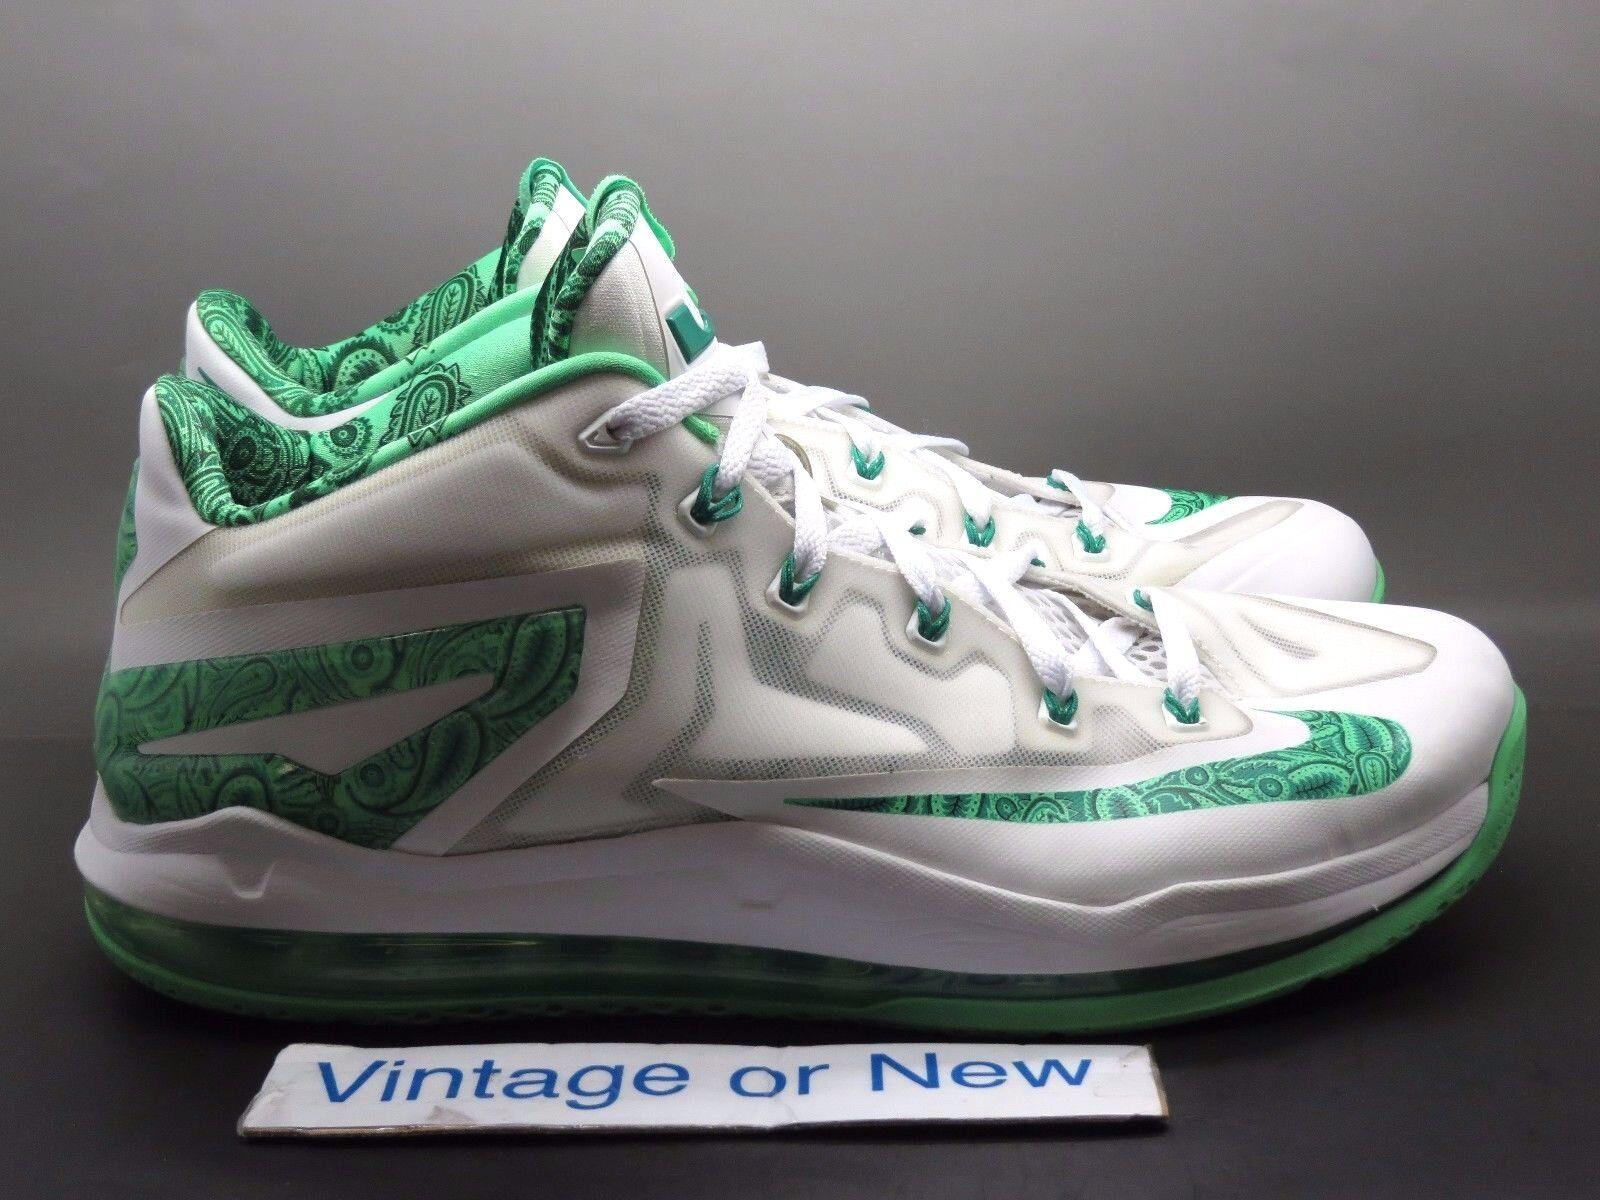 Nike LeBron XI 11 Low Easter sz 11.5